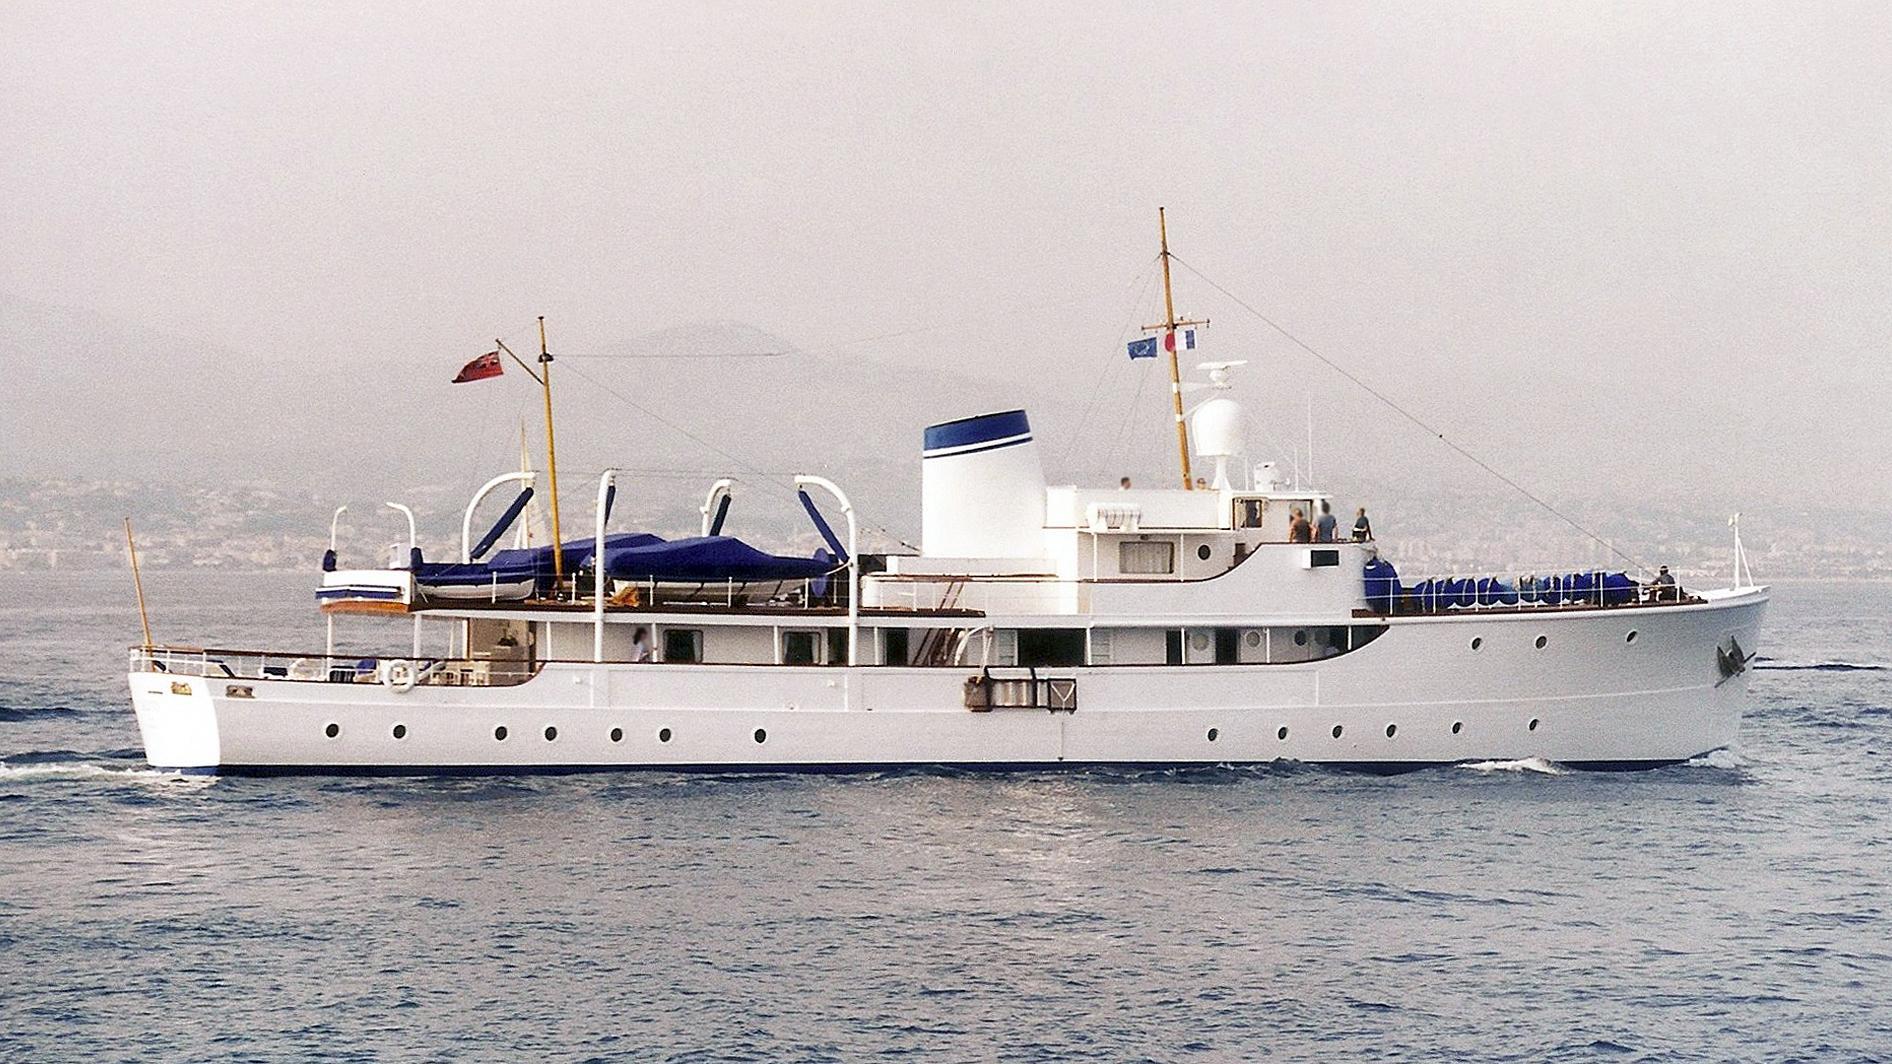 calisto-motor-yacht-astoria-1944-41m-profile